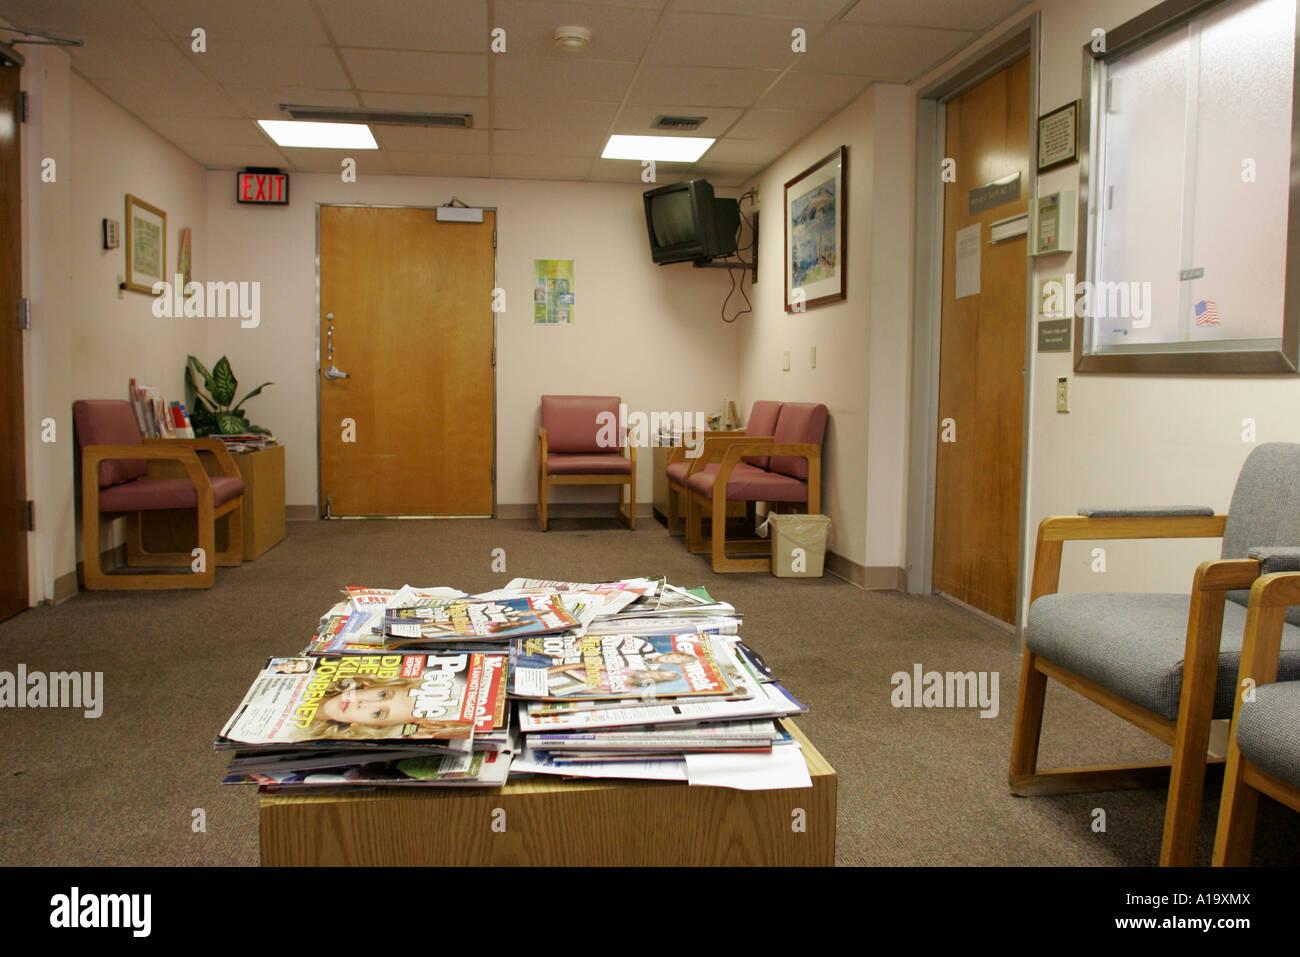 Chaises Salle D Attente Cabinet Medical miami beach florida hôpital mount sinai salle d'attente